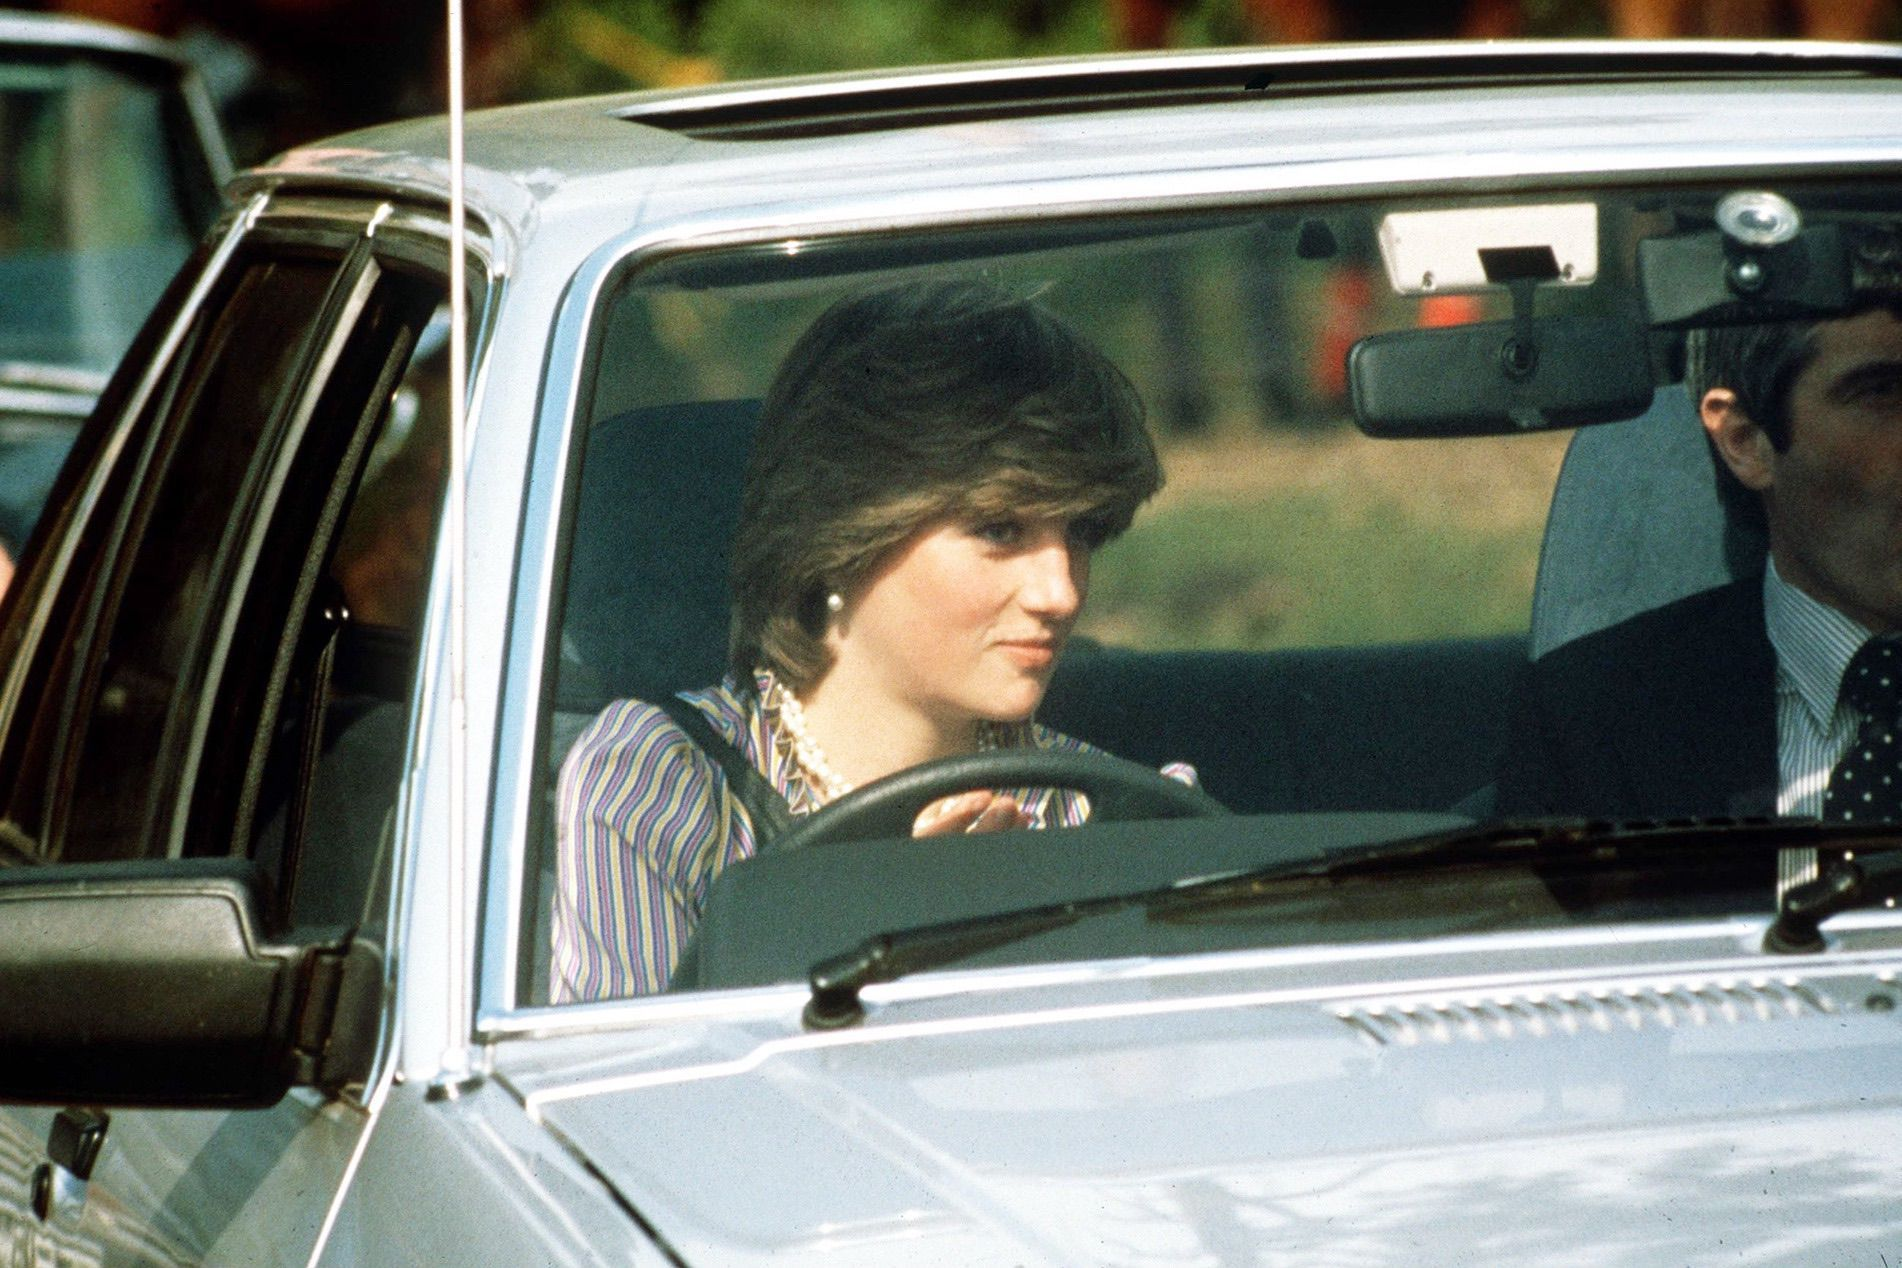 Princess_Diana_1981_Ford_Escort_Ghia-0009